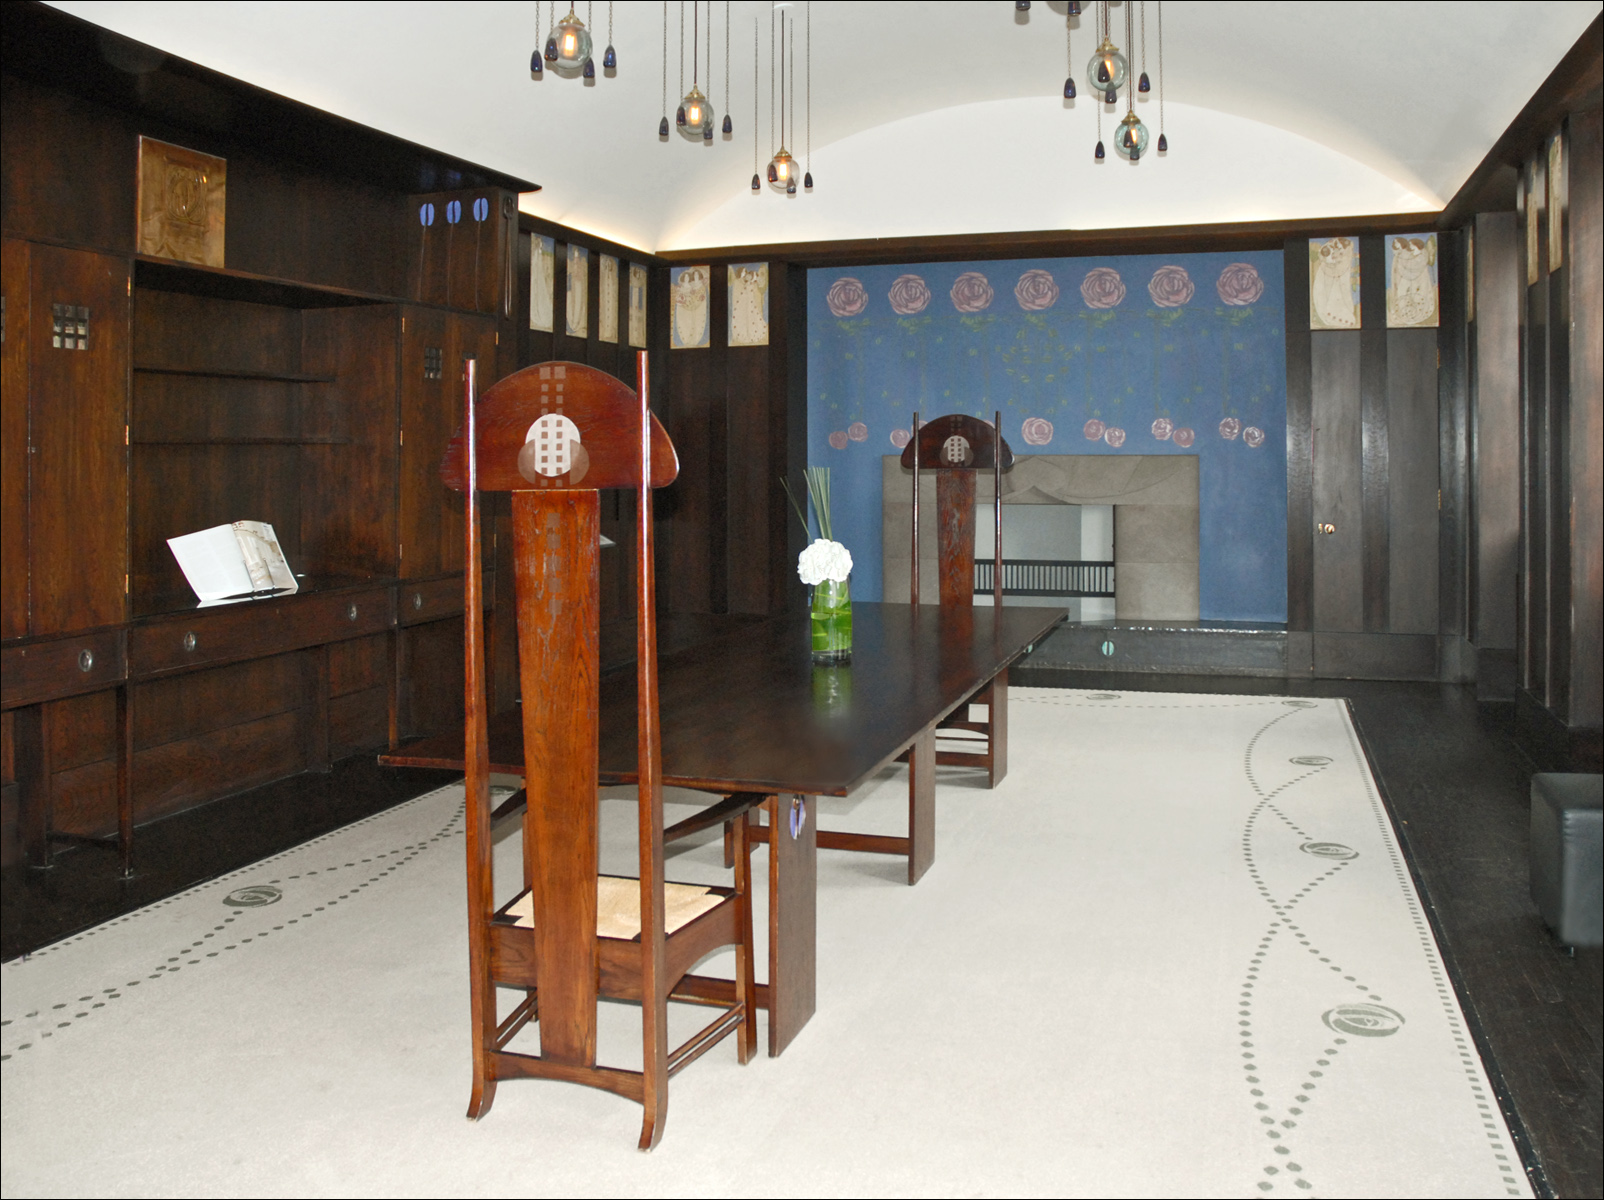 Piece Dining Room Set Under